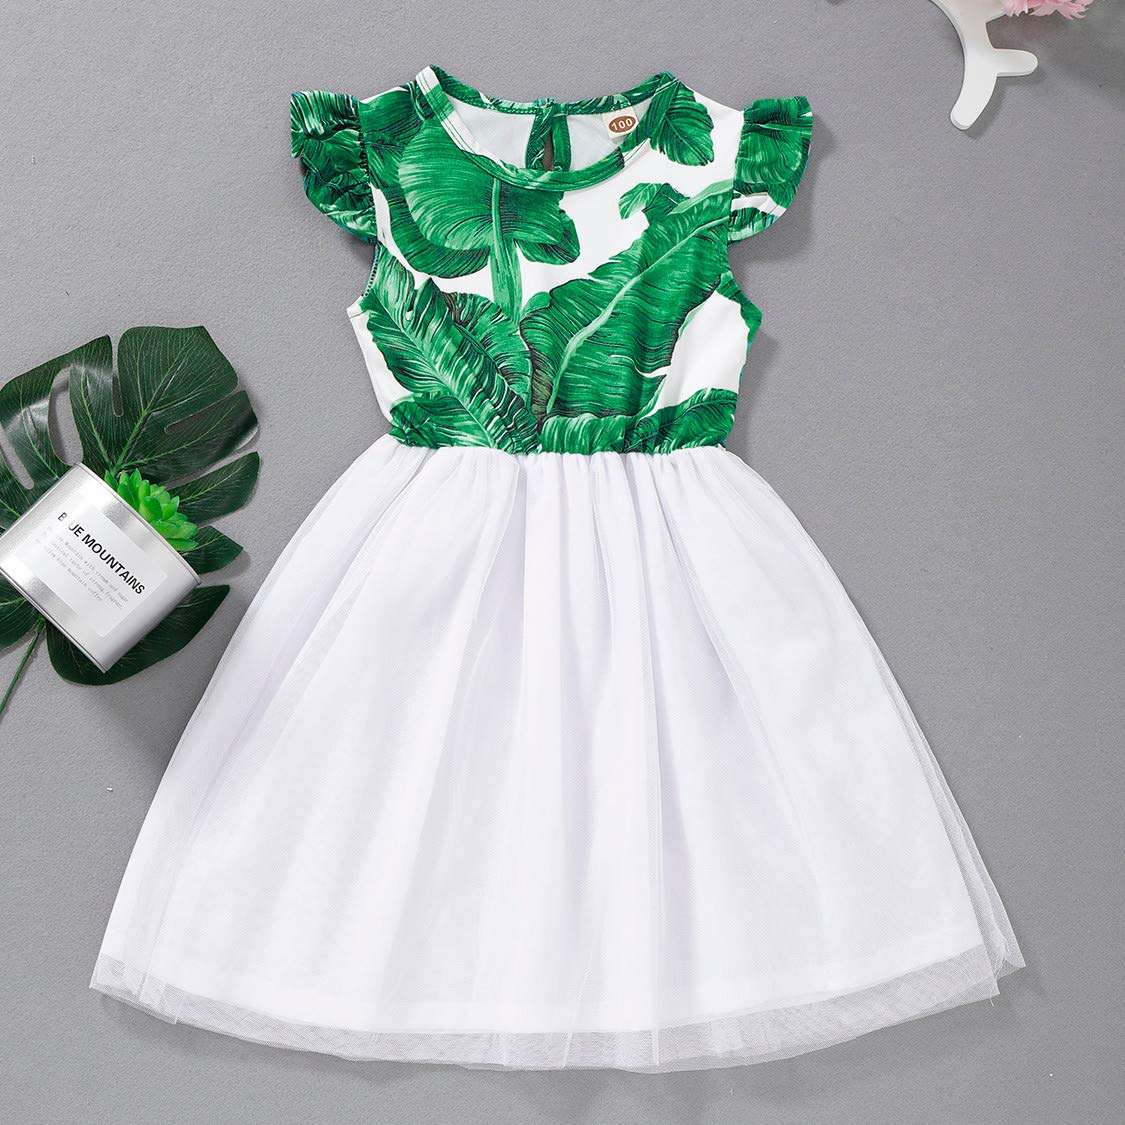 UK Toddler Baby Kid Dress Girls Letter Tulle Patchwork Hooded Sweatshirt Dresses